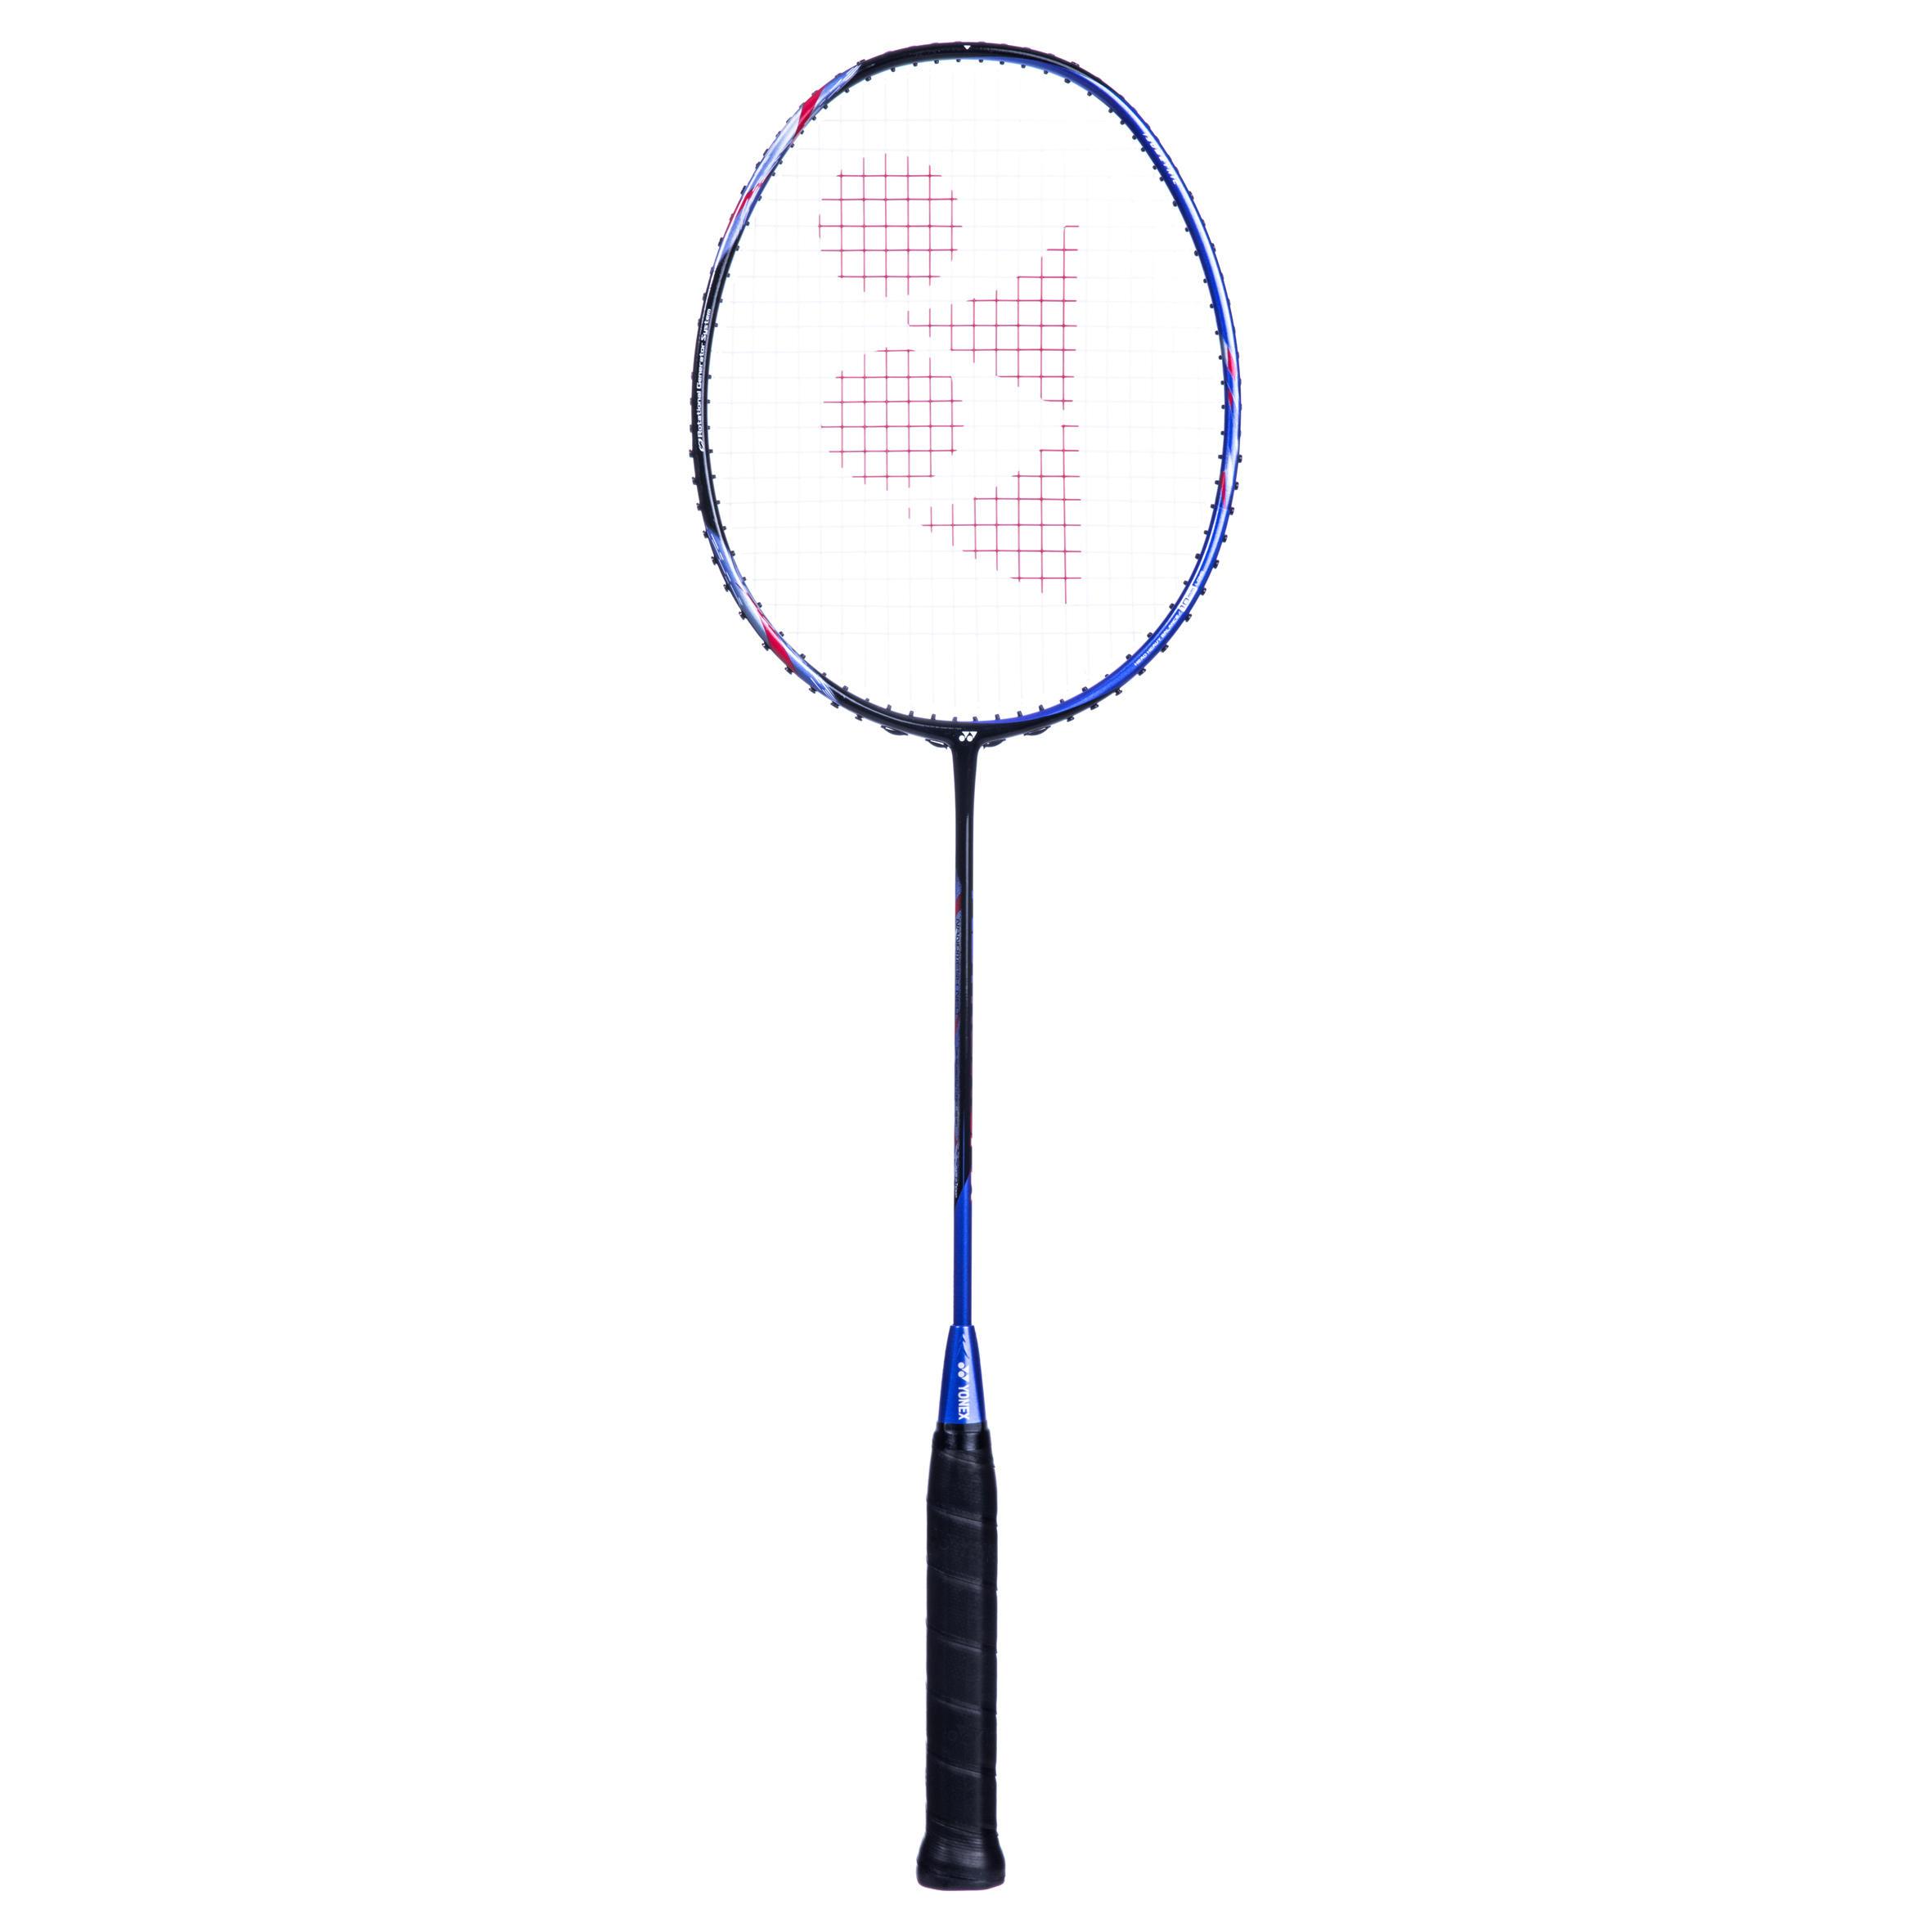 Yonex Badmintonracket Astrox 5 FX kopen